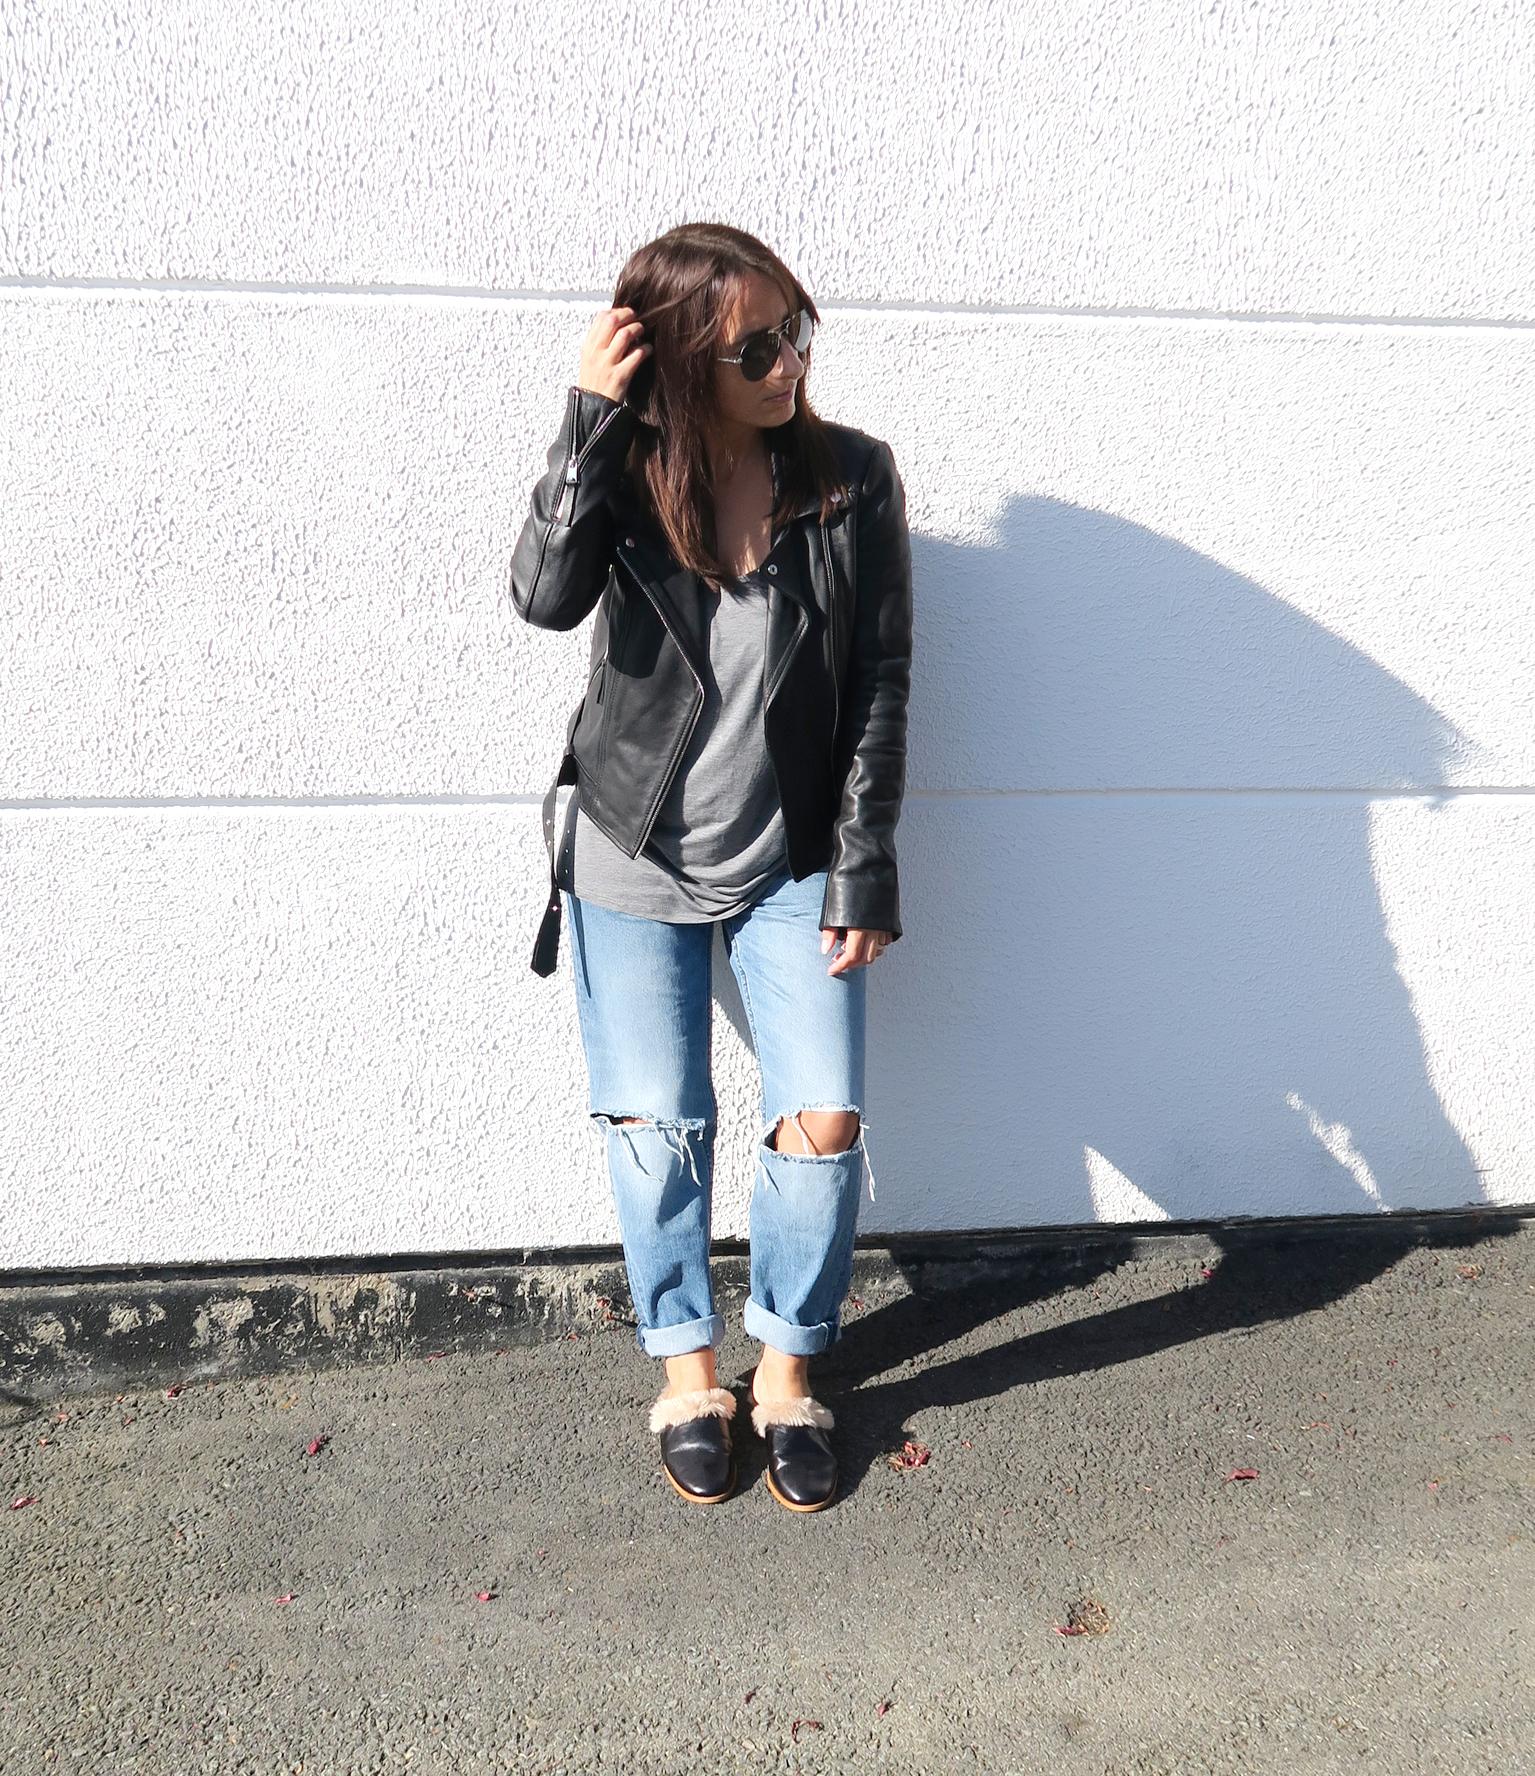 gucci-lookalike-flat-shoes-blogger-bloggerstyle-modesalat-4